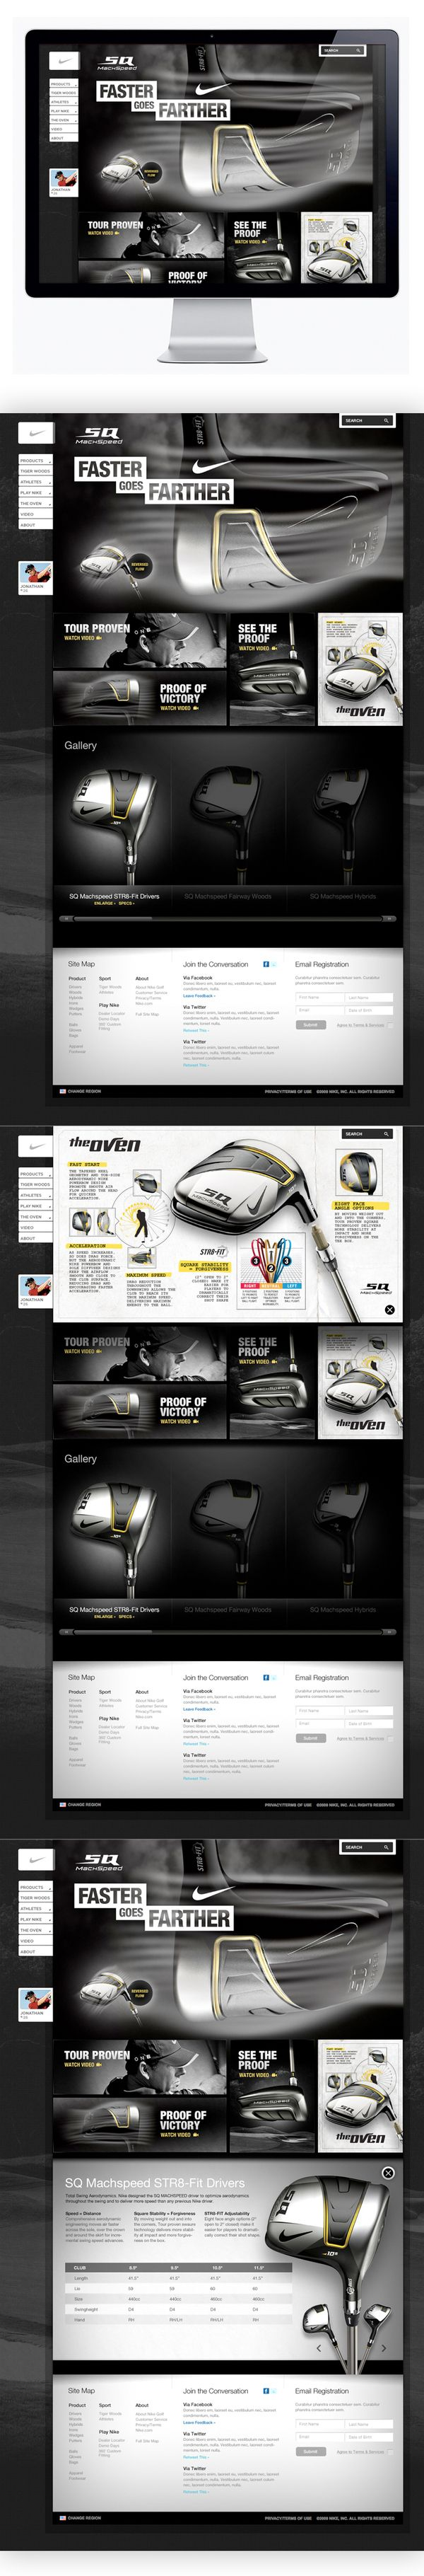 Nike Golf - Machspeed  #webdesign #it #web #design #layout #userinterface #website #webdesign <<< repinned by an #advertising #agency from #Hamburg / #Germany - www.BlickeDeeler.de